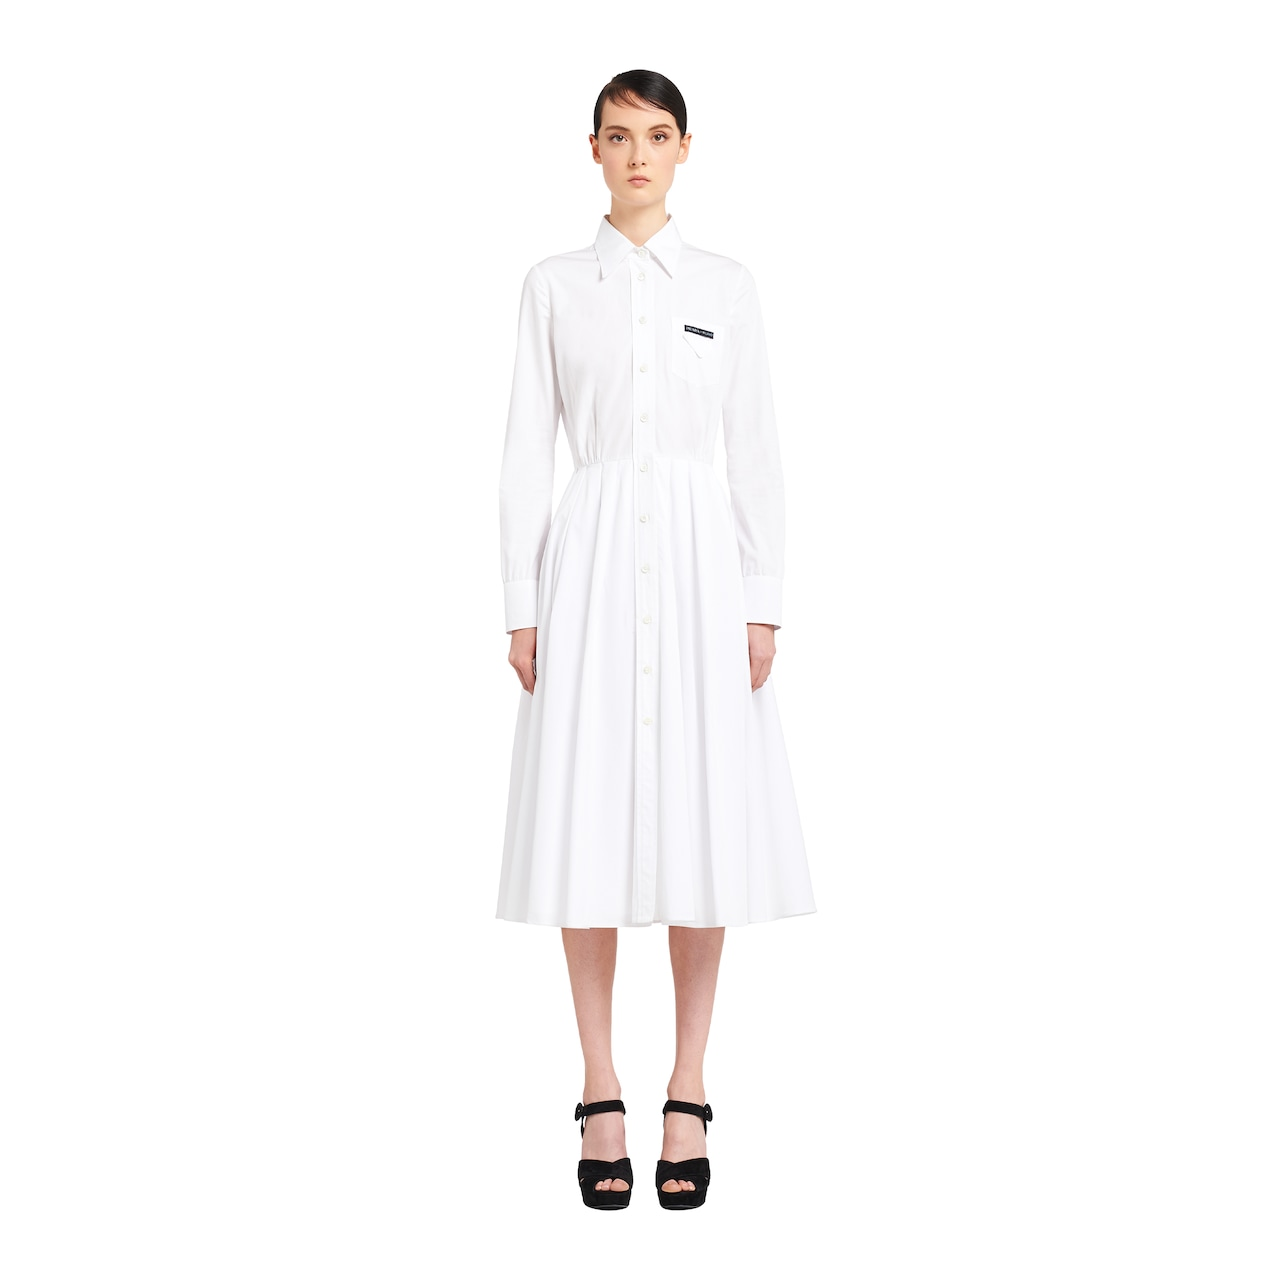 Robe chemise avec jupe plissée